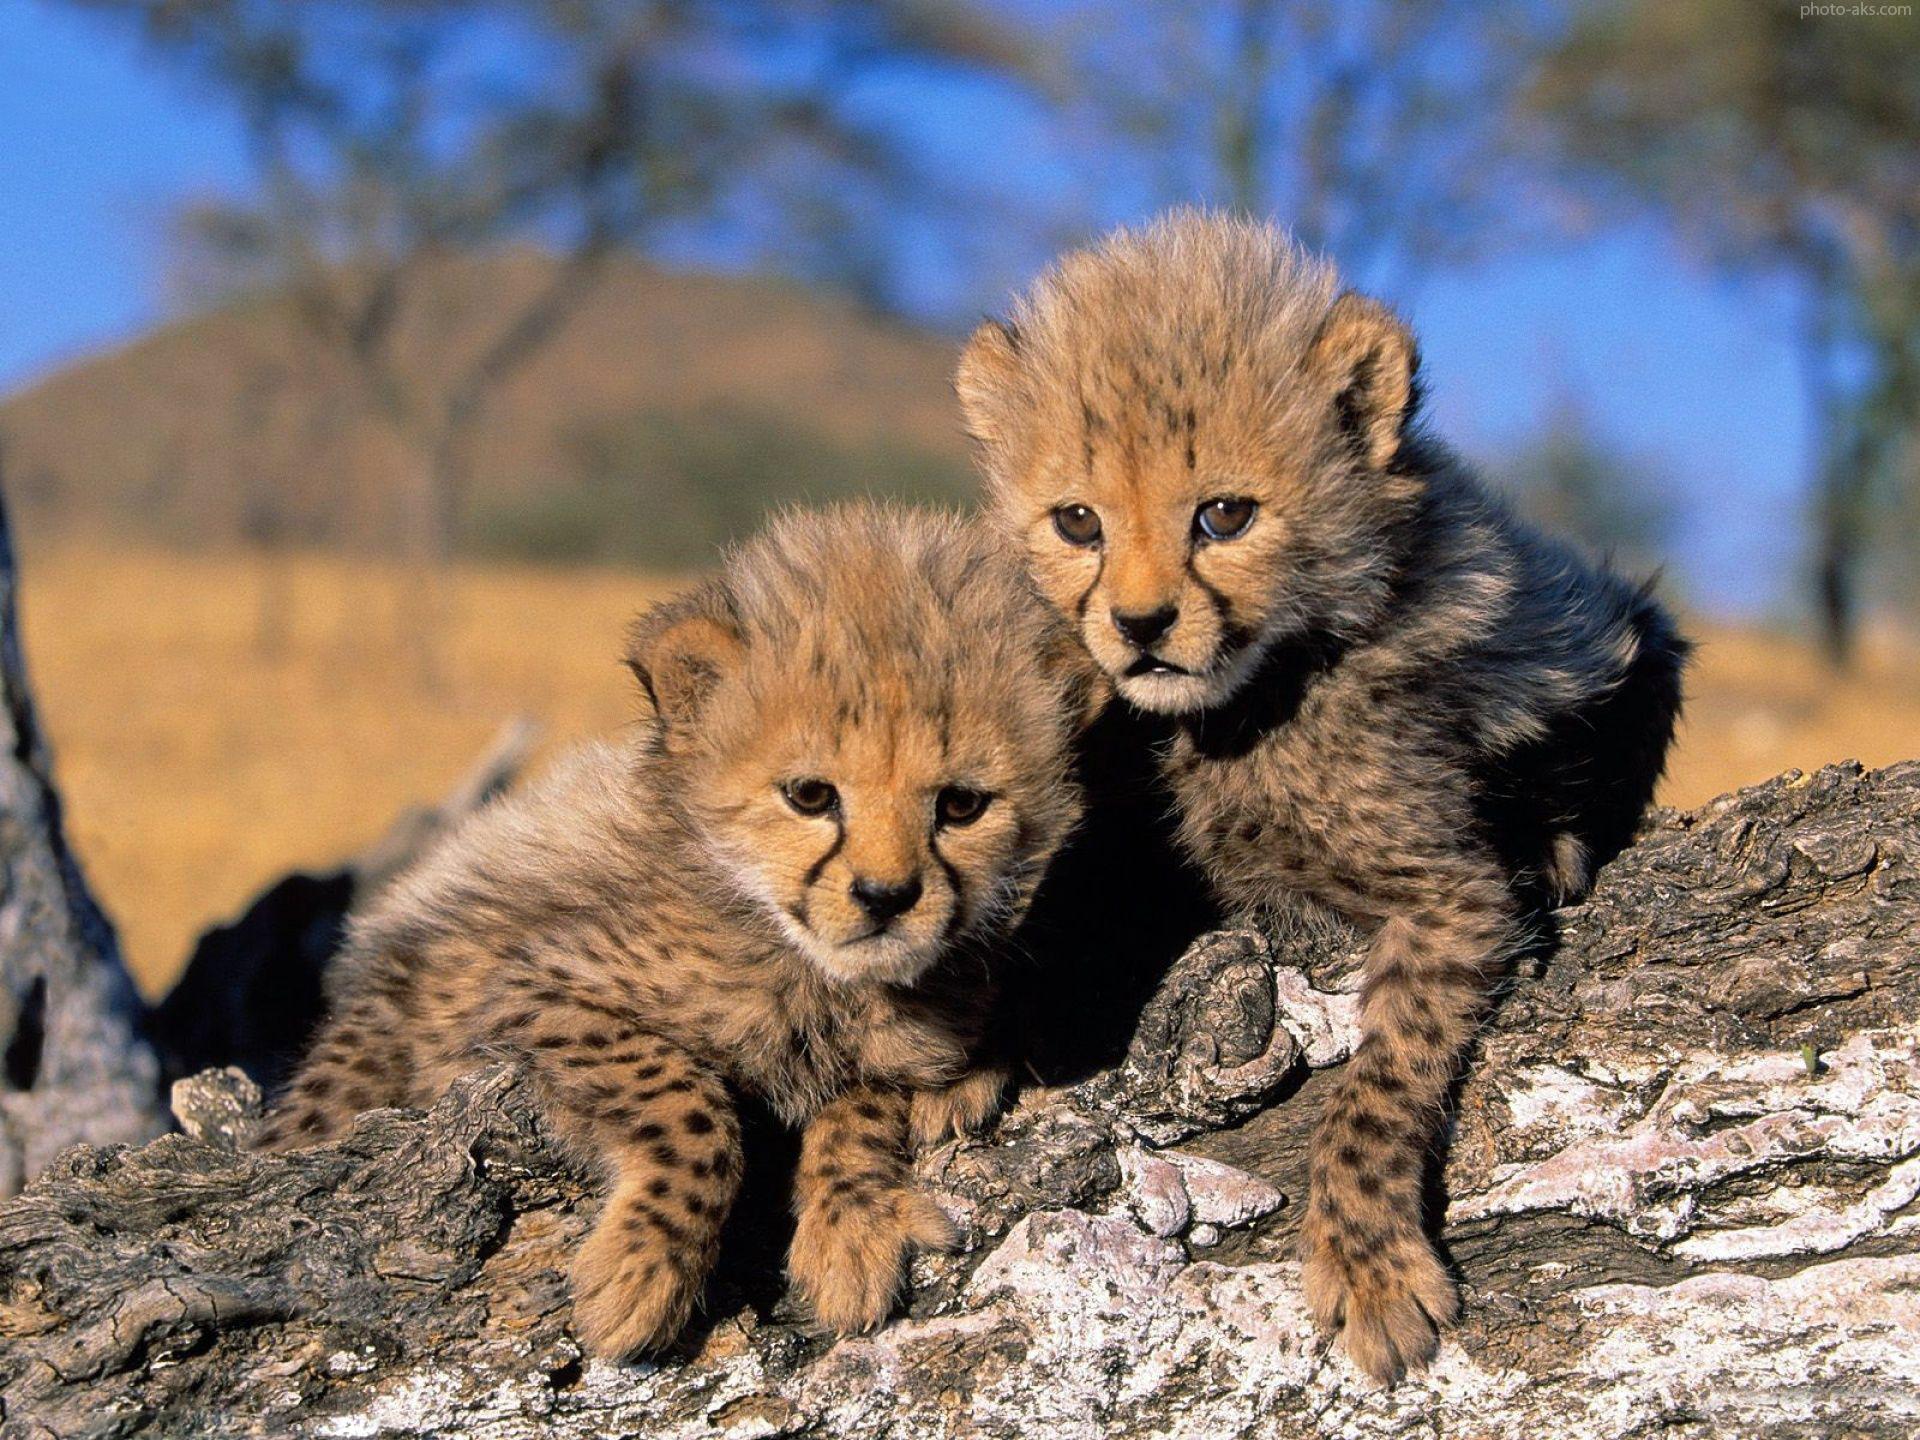 iranian_cheetah_baby